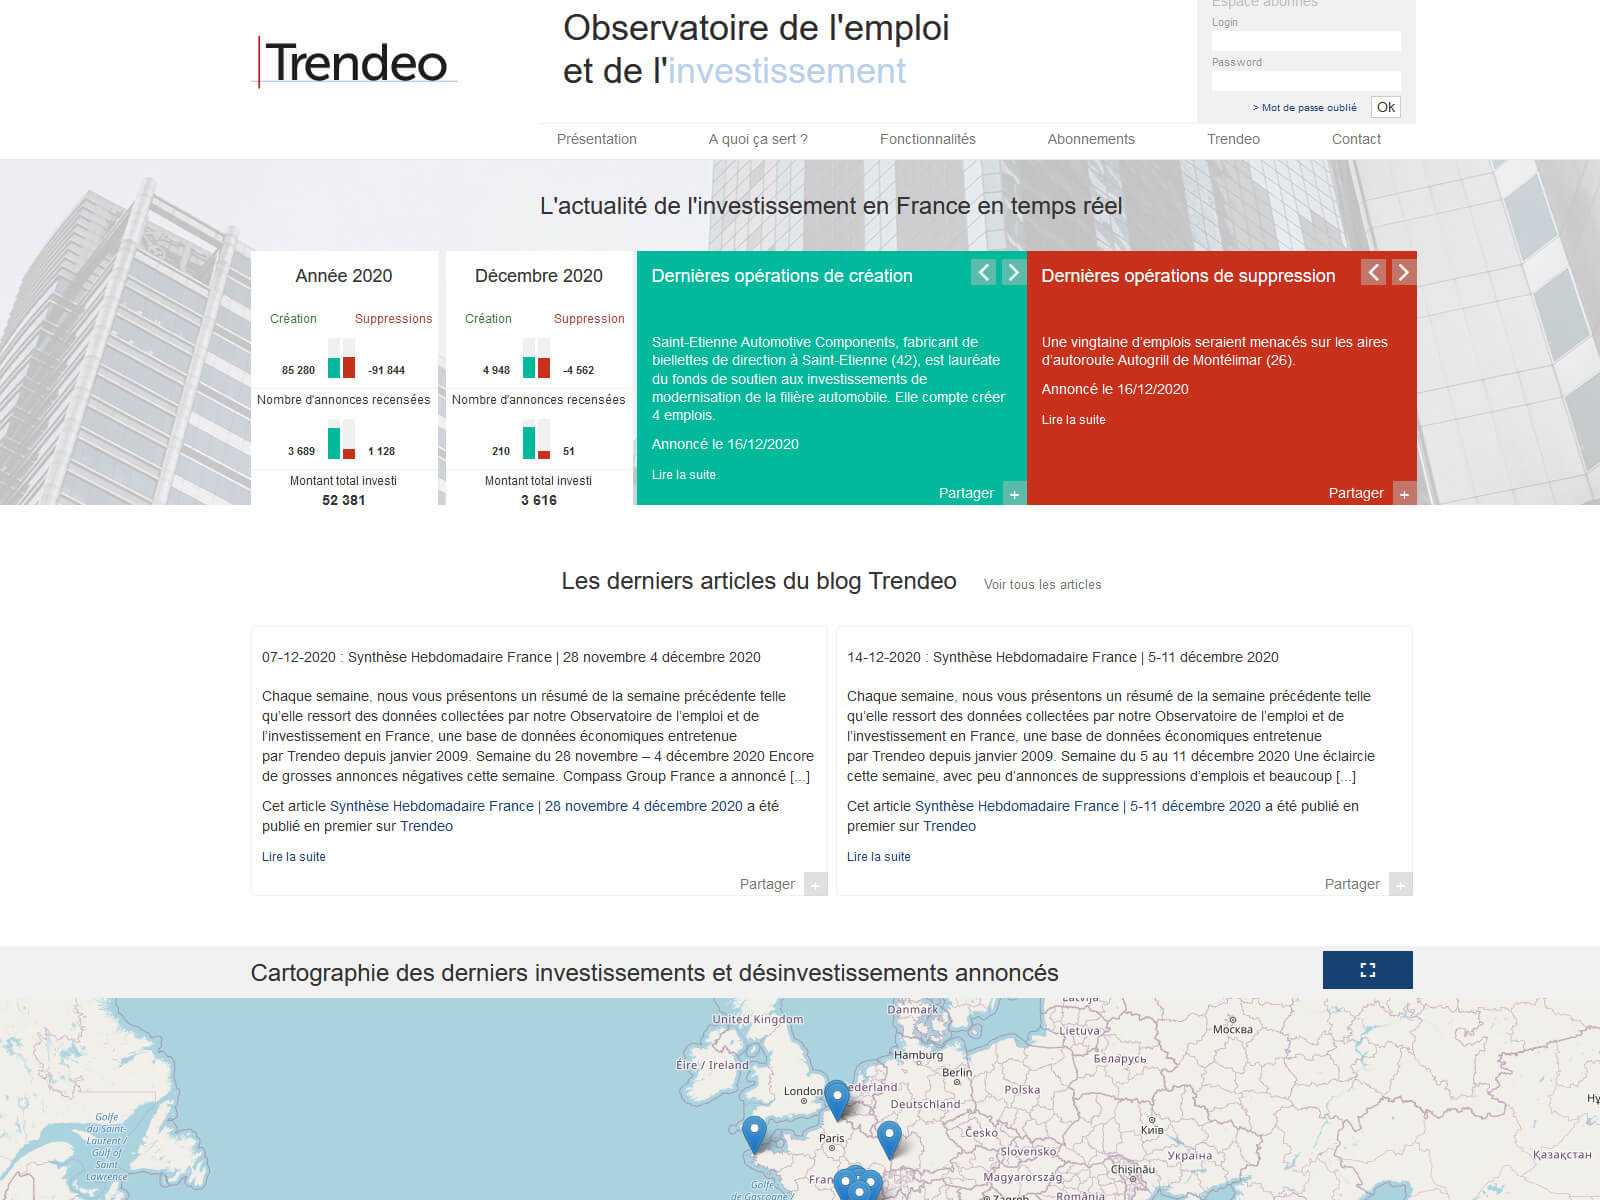 Accueil de l'applicatif Trendeo, l'observatoire de l'emploi et de l'investissement